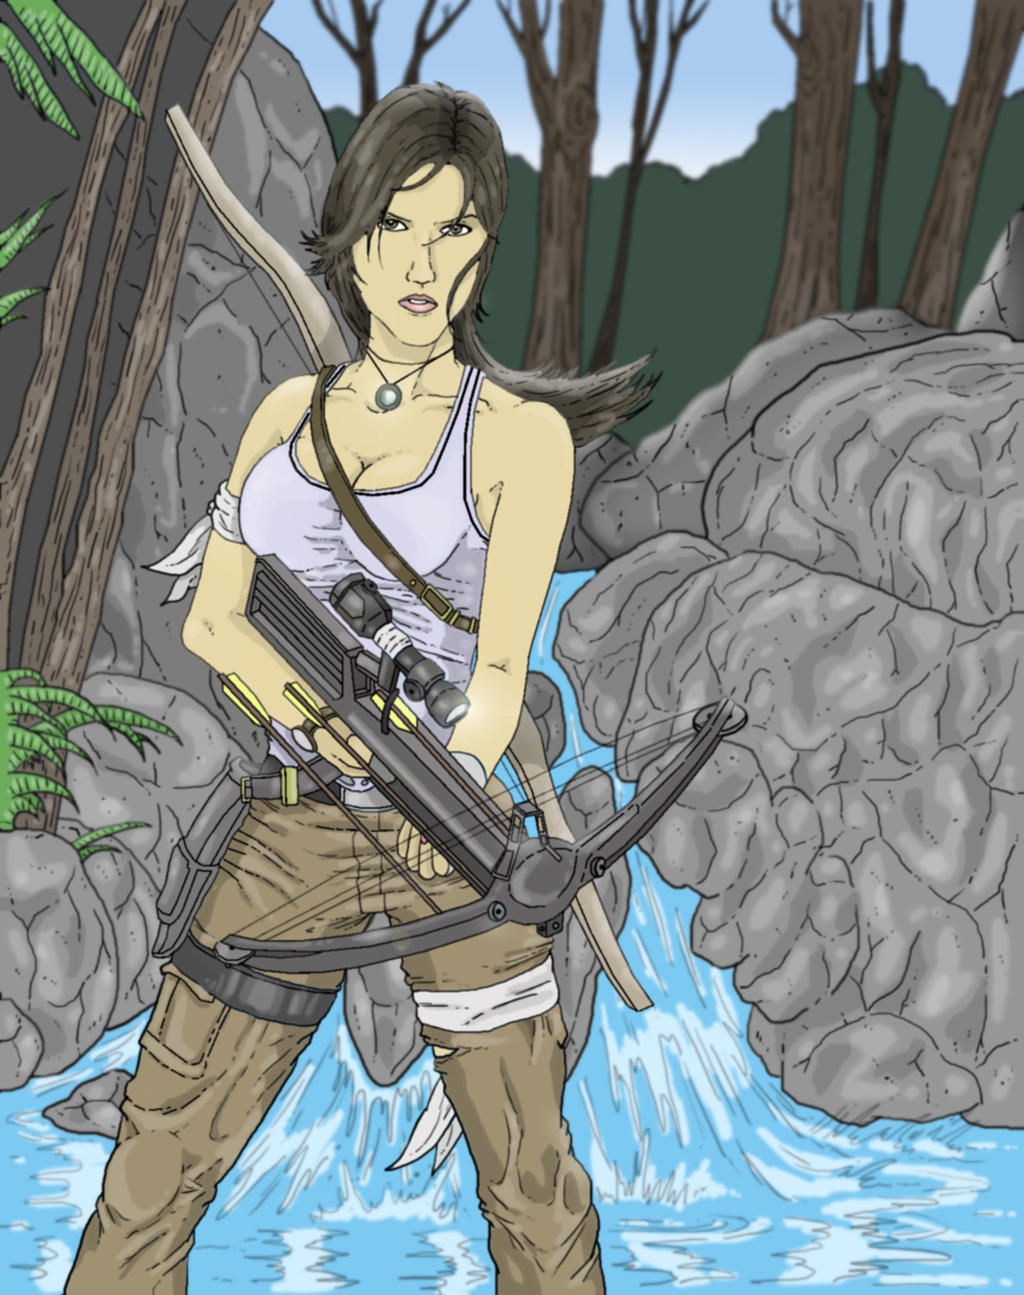 Tomb Raider Color No Watermark by PatrickOlsen